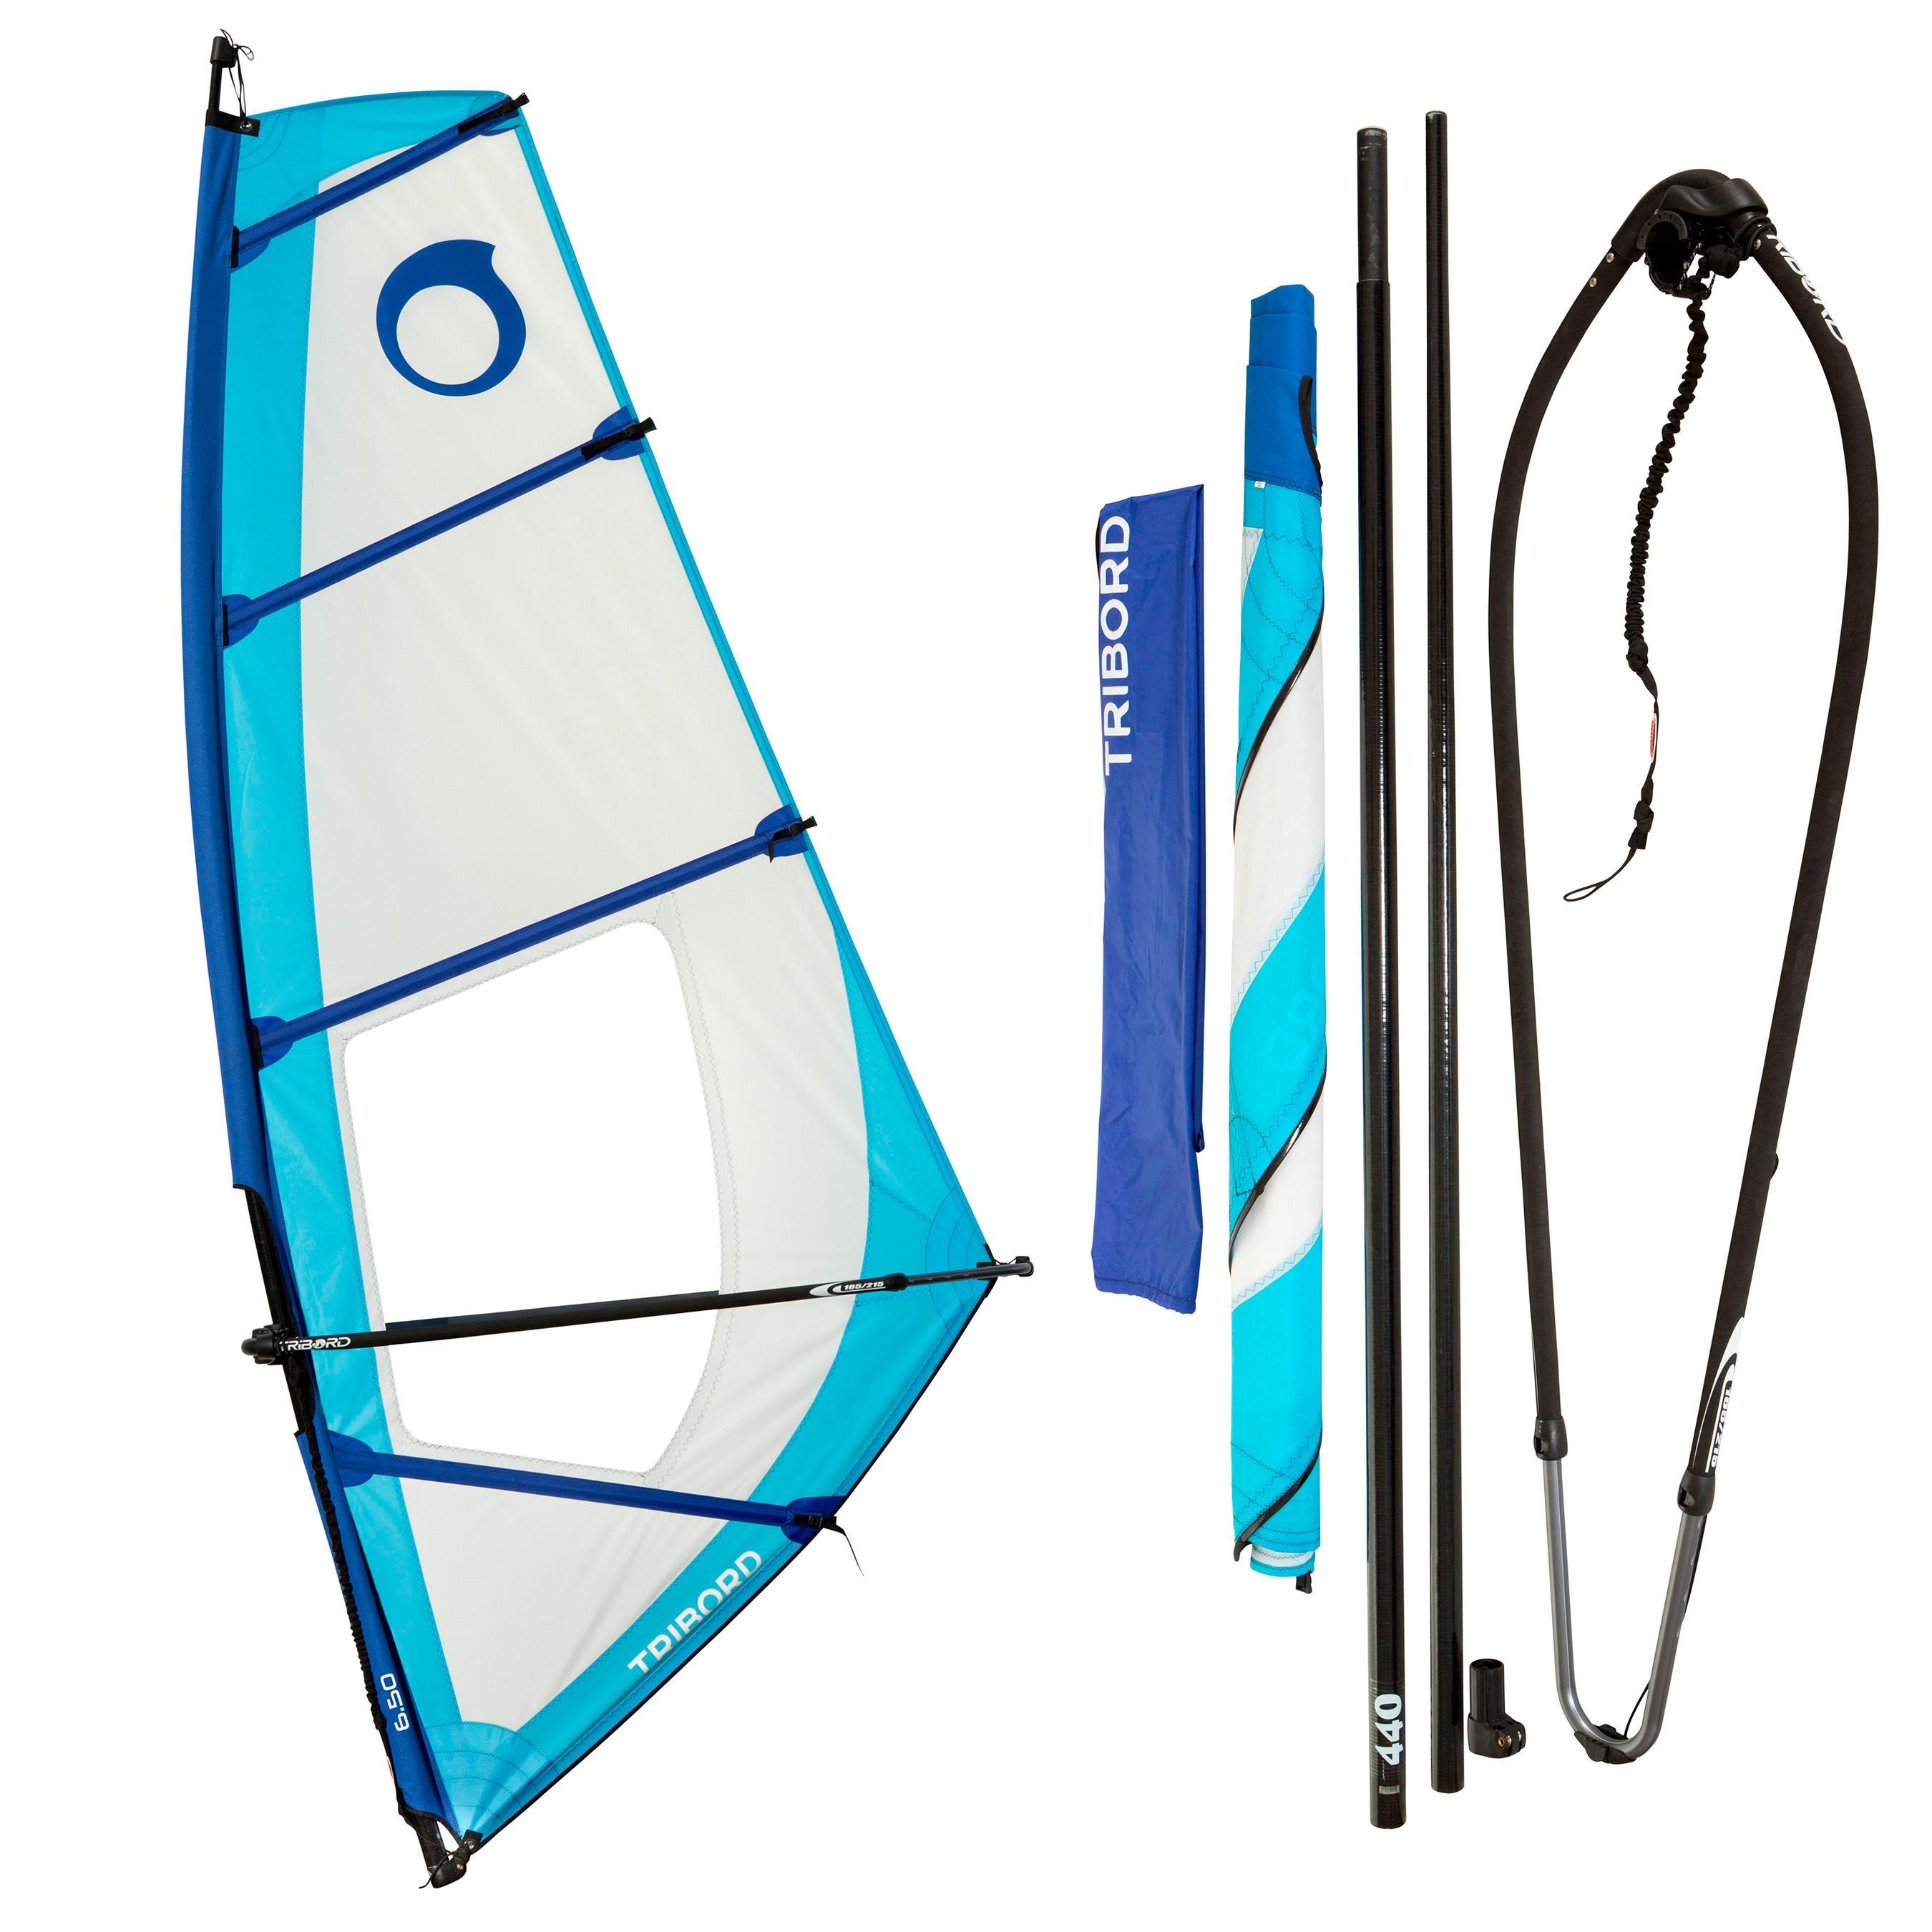 Tribord Windsurf tuigage 5,5 m� voor volwassenen